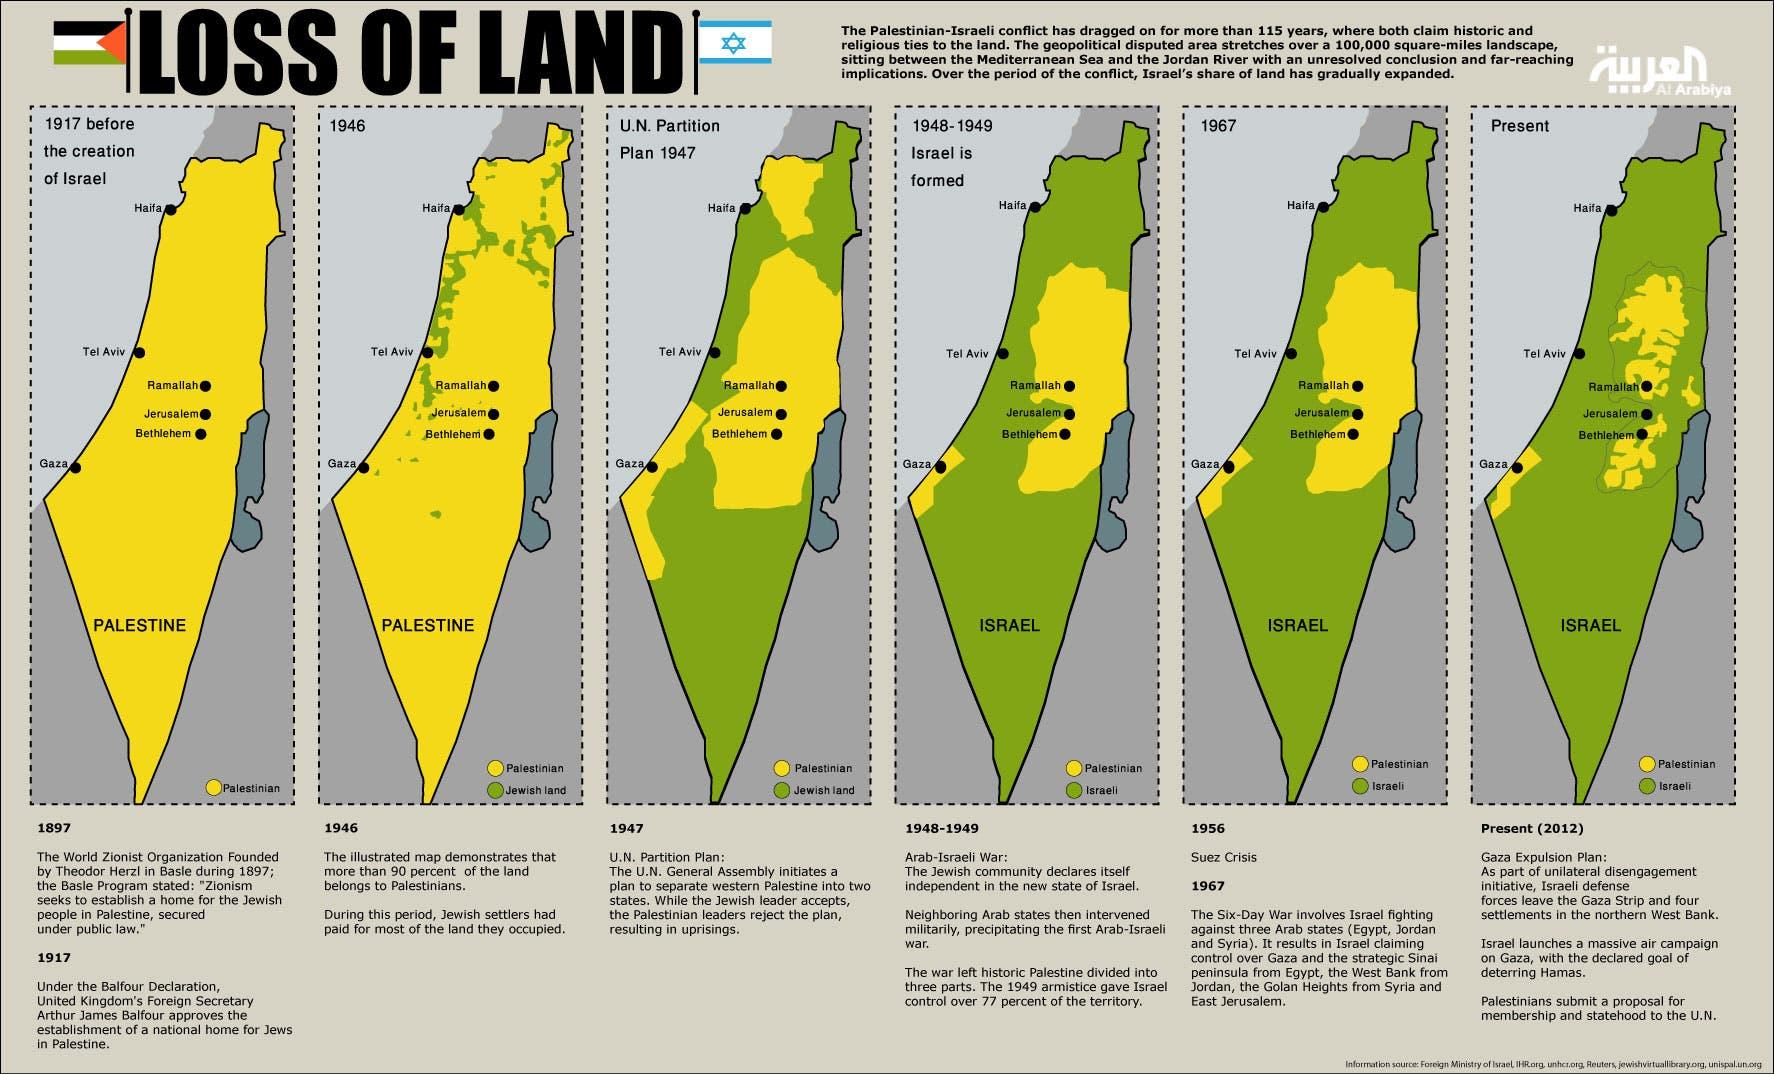 Info-graphic: Loss Of Land - How Palestinians gradually lost their land over the years. (Design by Farwa Rizwan / Al Arabiya English)